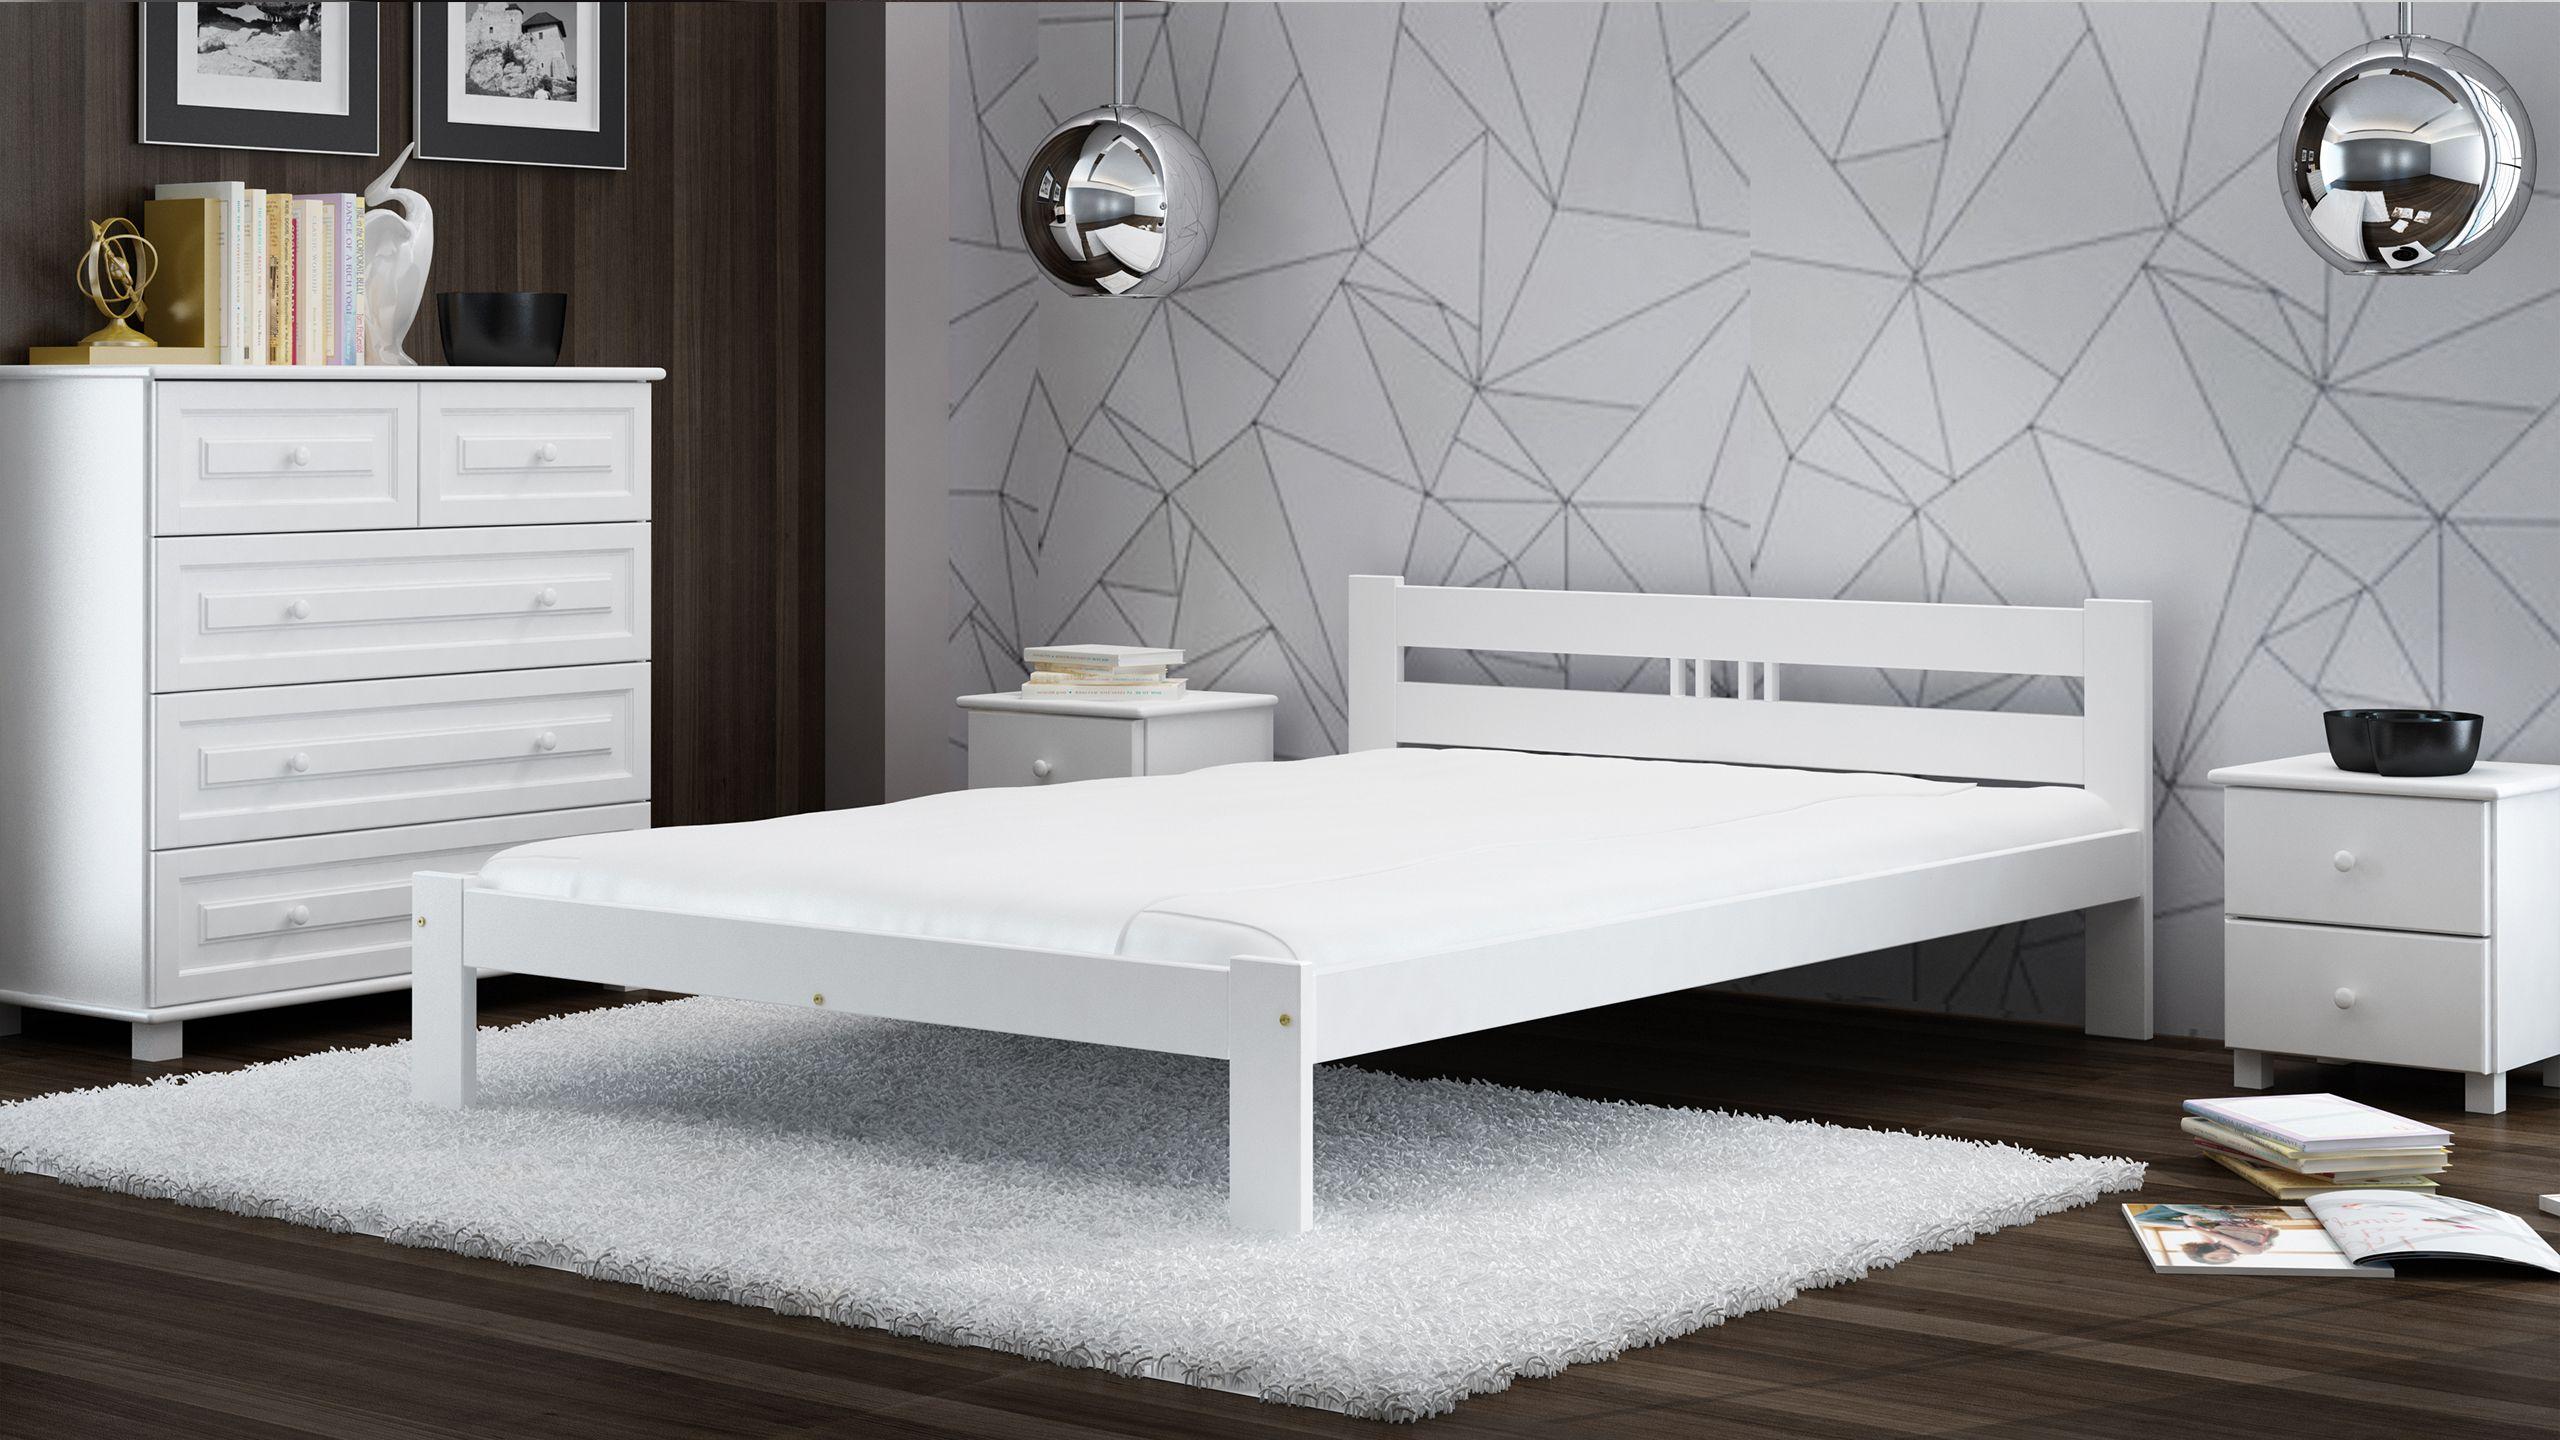 Weisses Bett Mit Matratze Und Lattenrost Garantiert Erholsamen